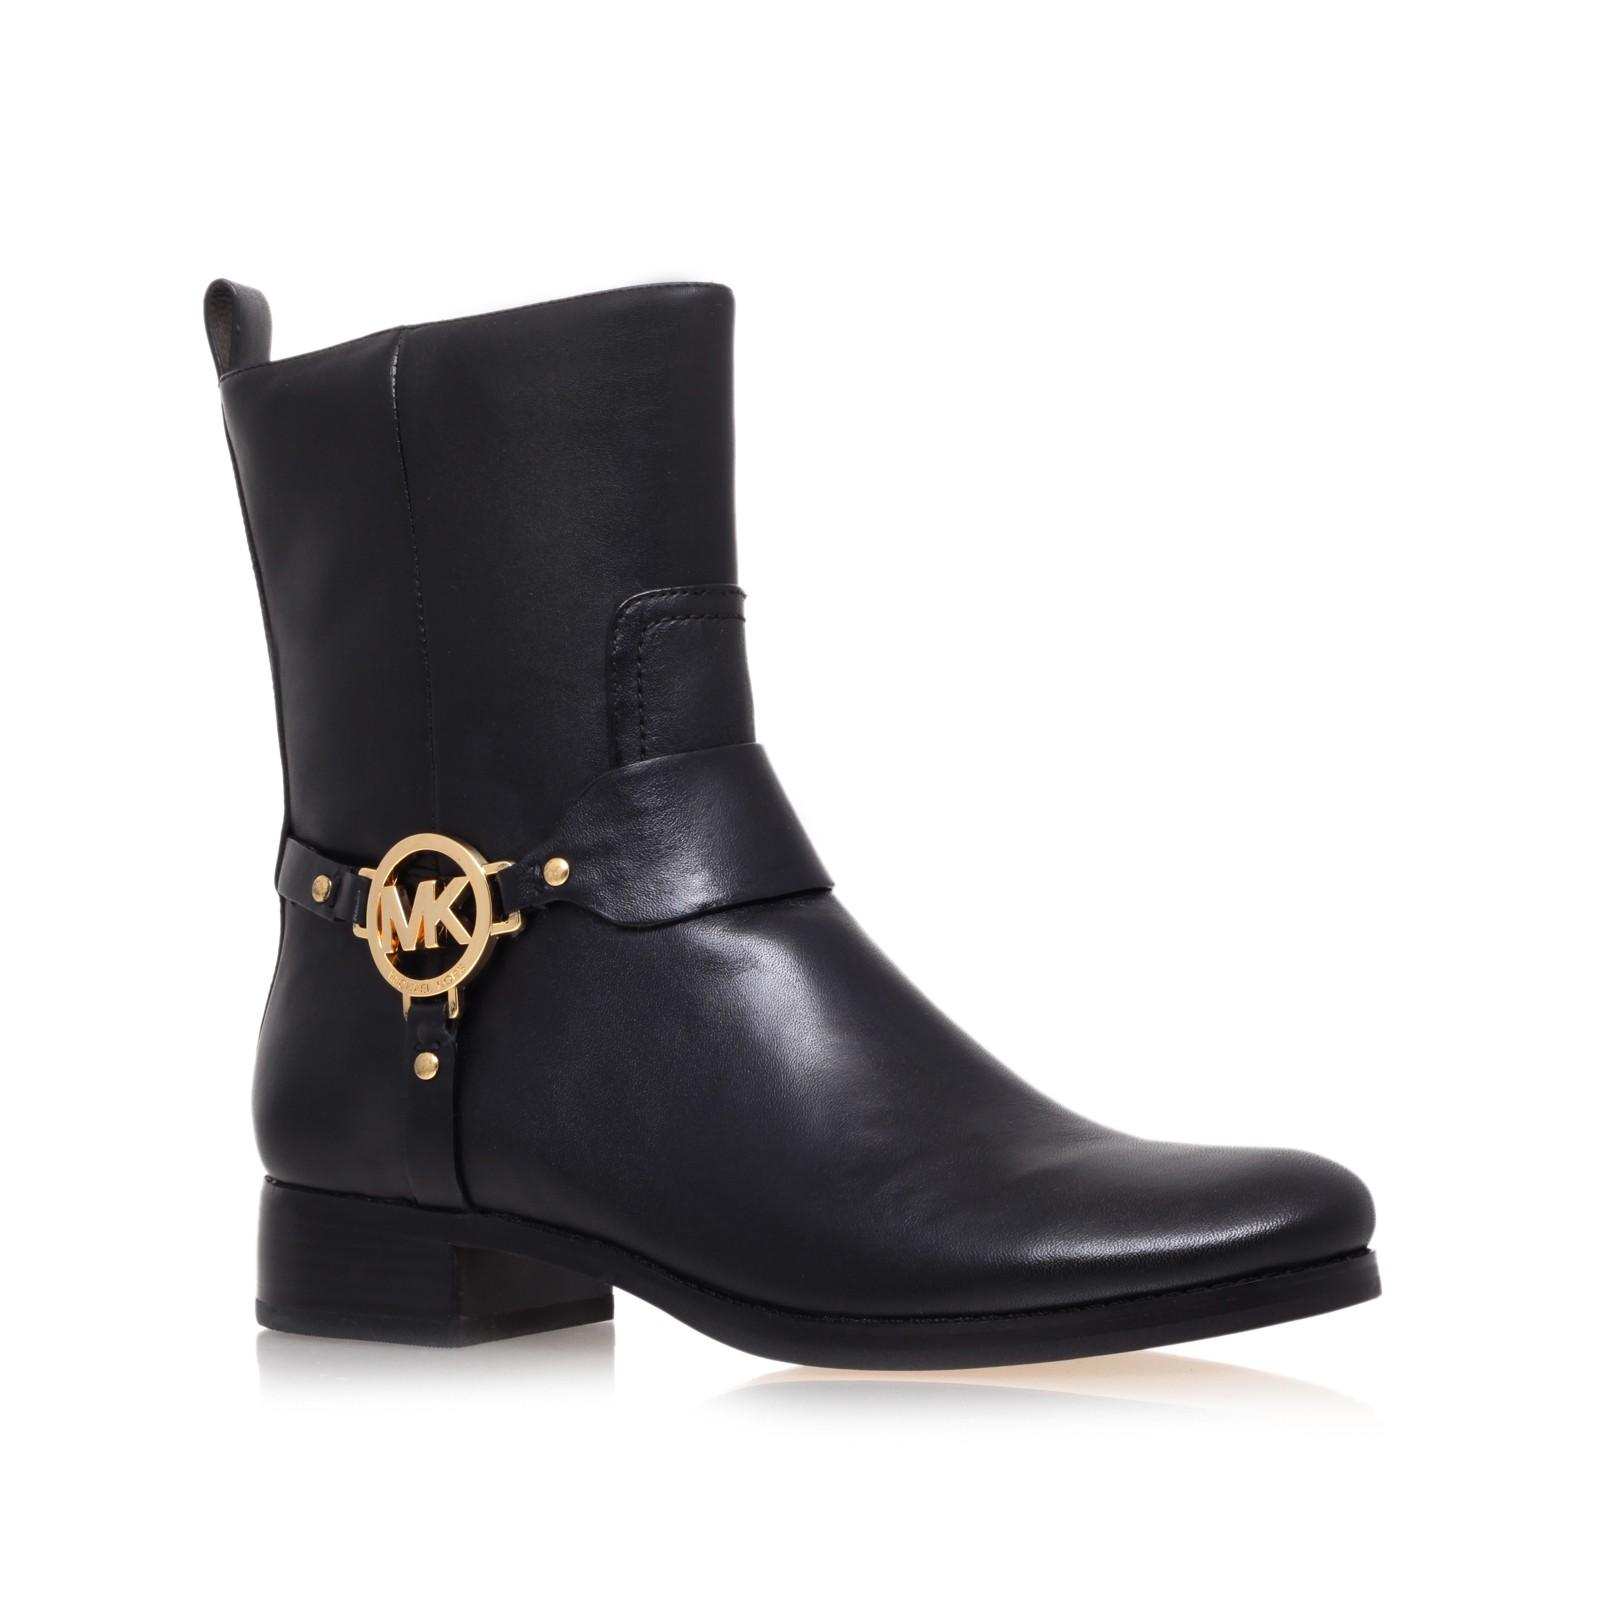 michael kors fulton harness bootie low heel ankle boots in. Black Bedroom Furniture Sets. Home Design Ideas